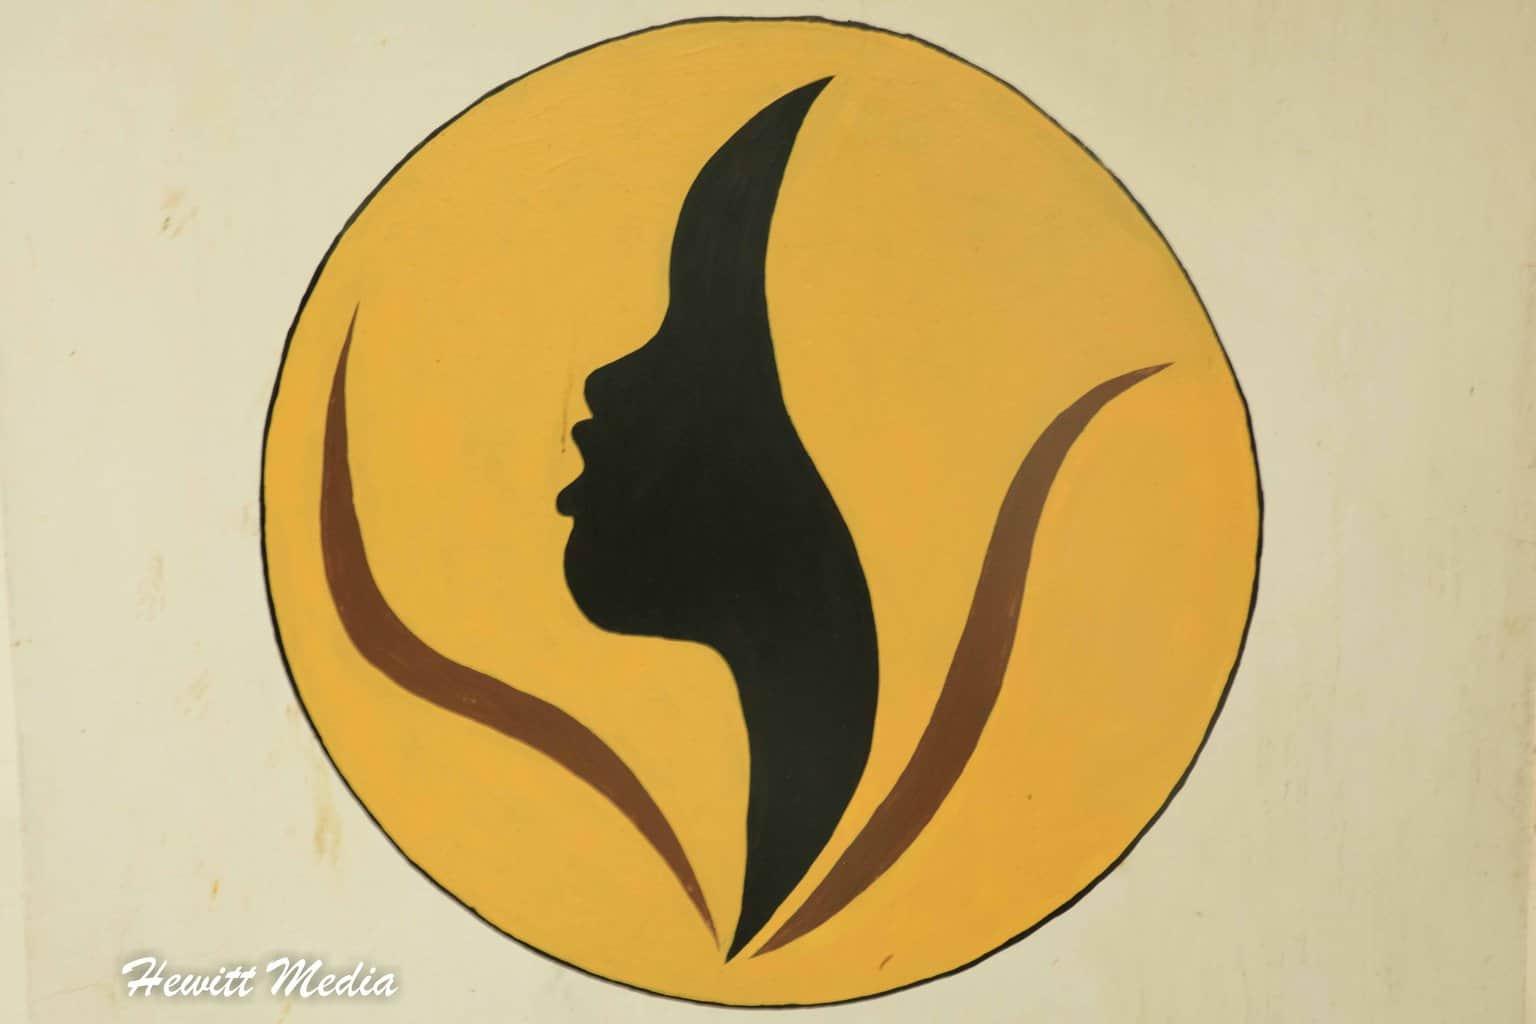 The logo for Kahawa Coffee